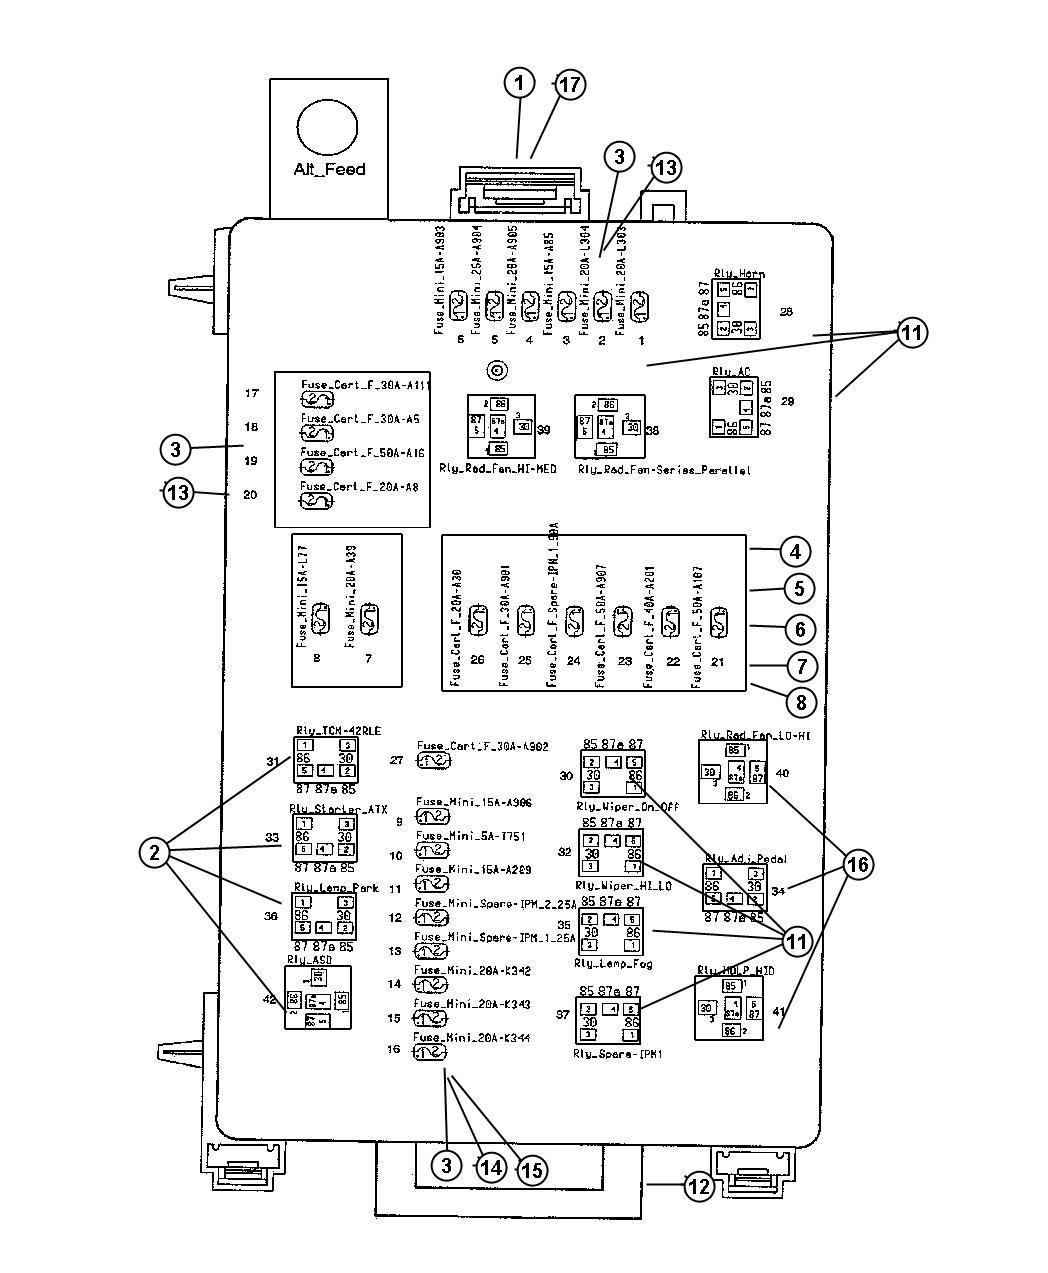 2007 dodge charger fuse box manual